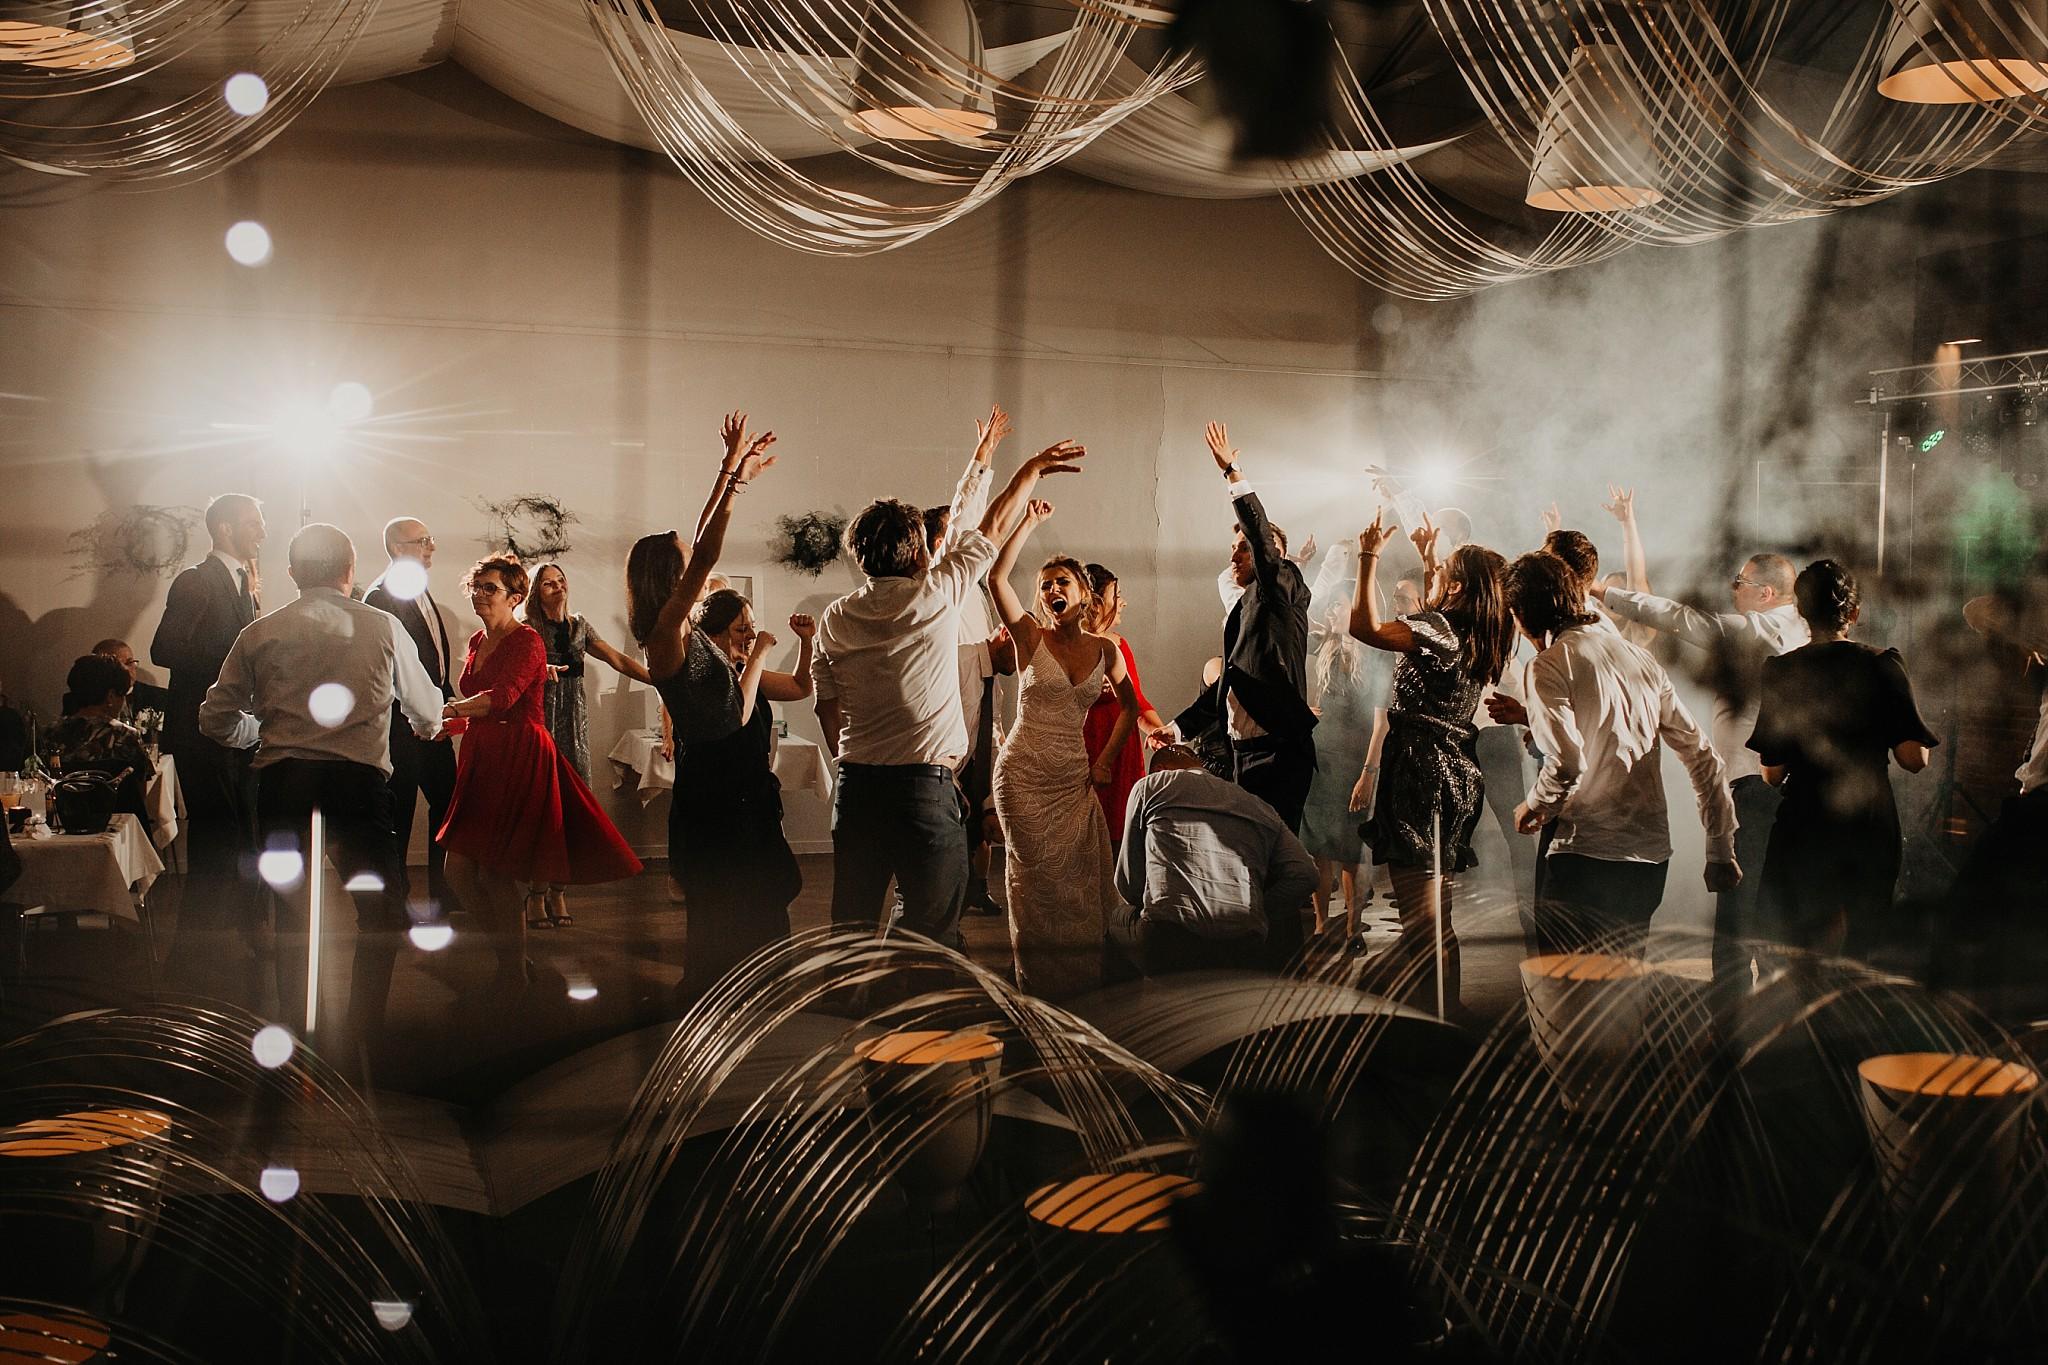 fotograf poznan wesele dobra truskawka piekne wesele pod poznaniem wesele w dobrej truskawce piekna para mloda slub marzen slub koronawirus slub listopad wesele koronawirus 487